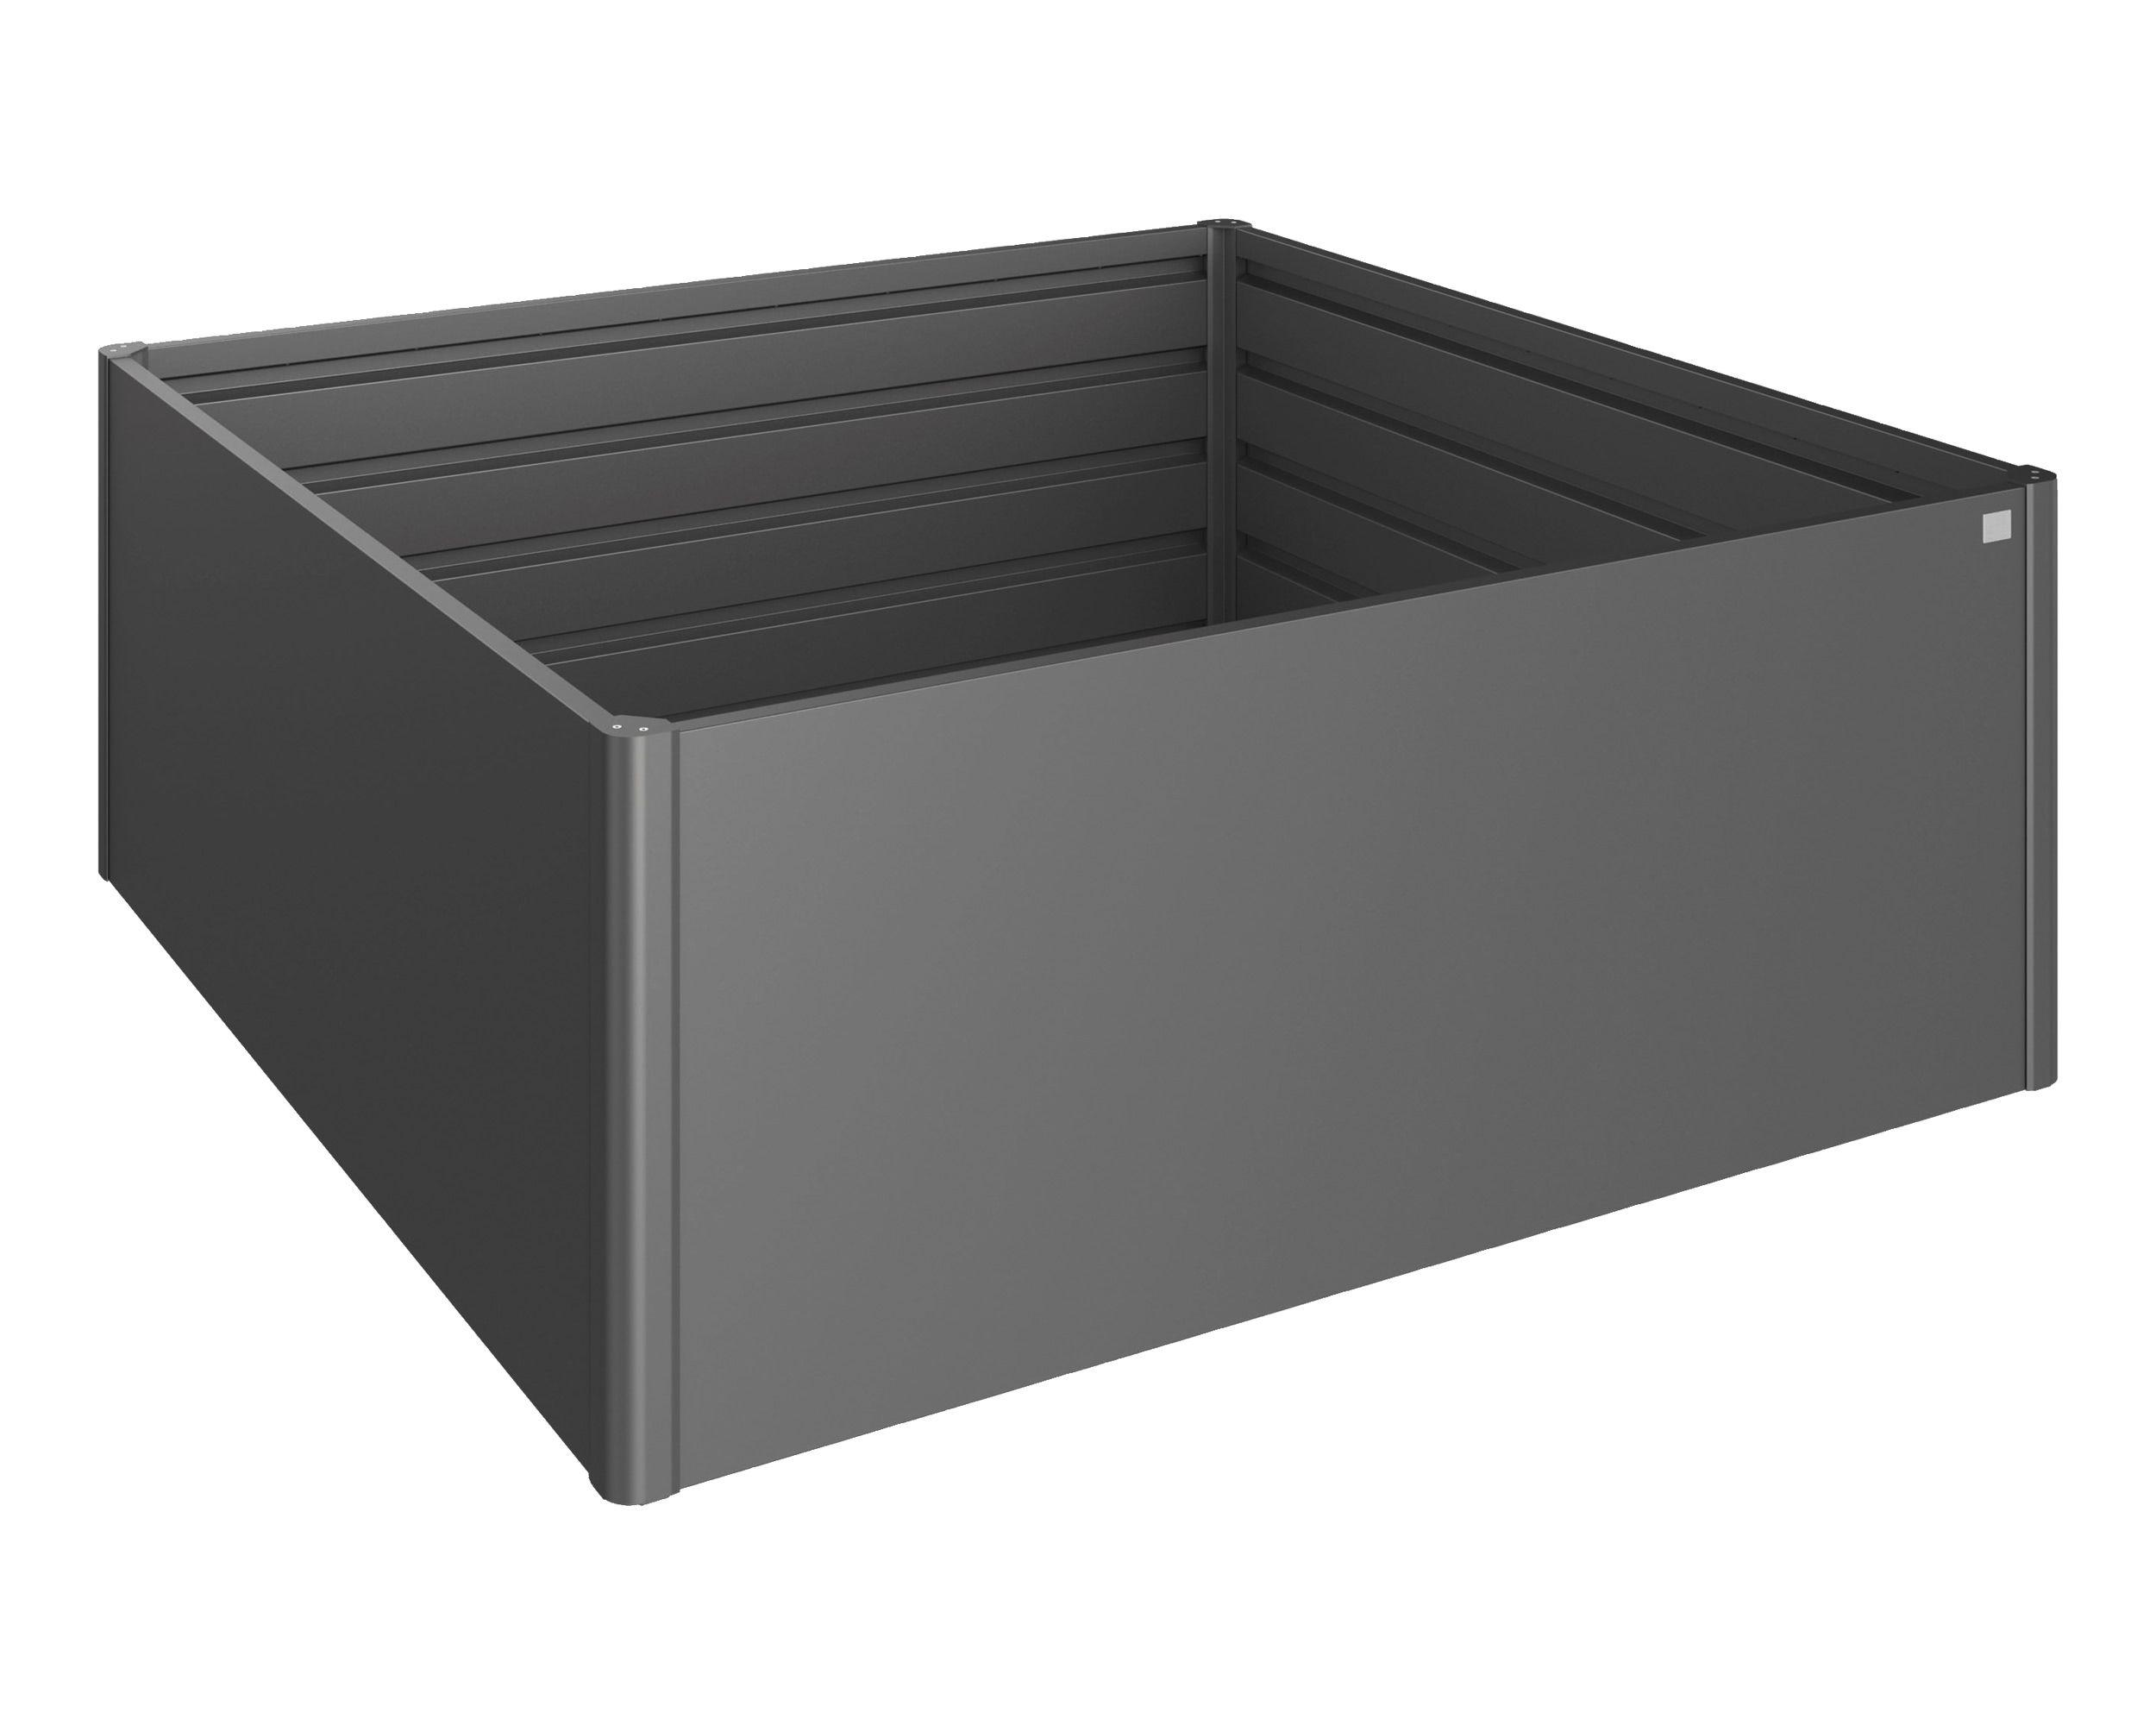 Hochbeet, 201x201 cm